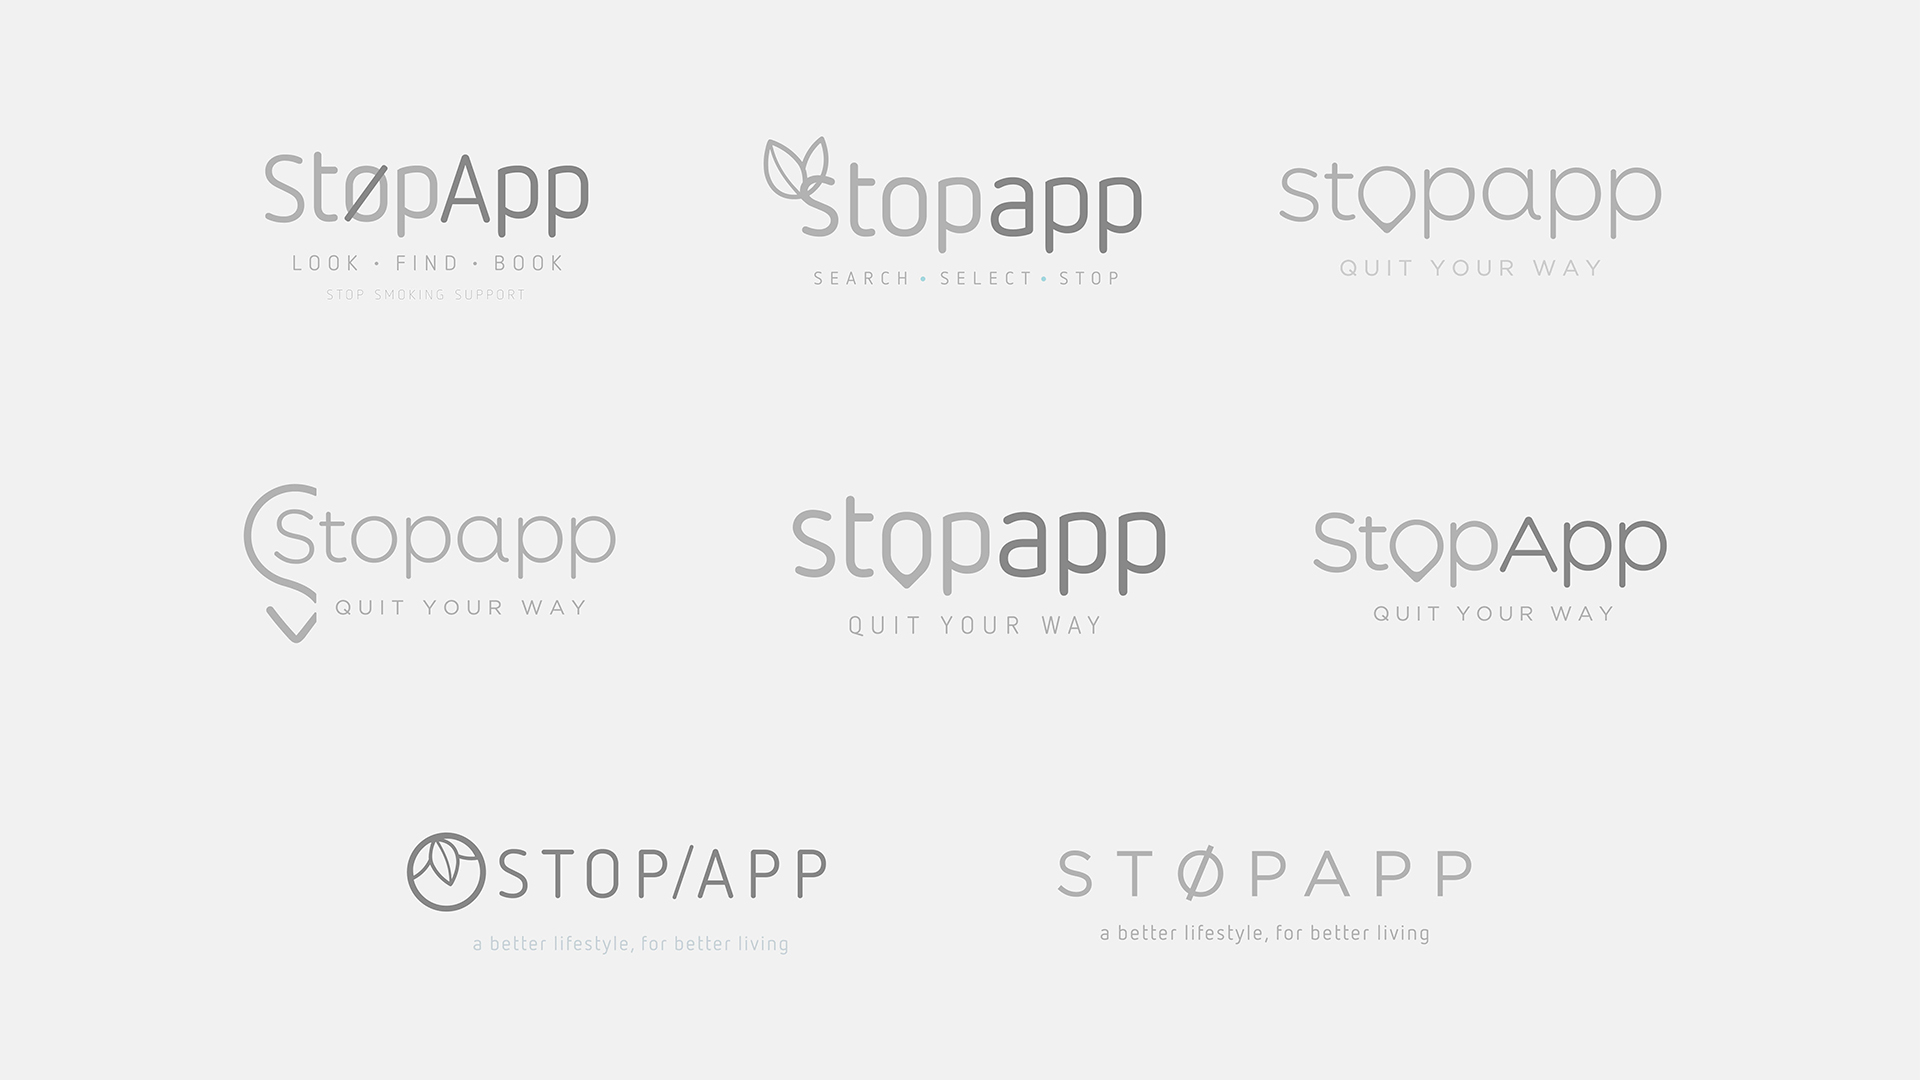 Stopapp Logos